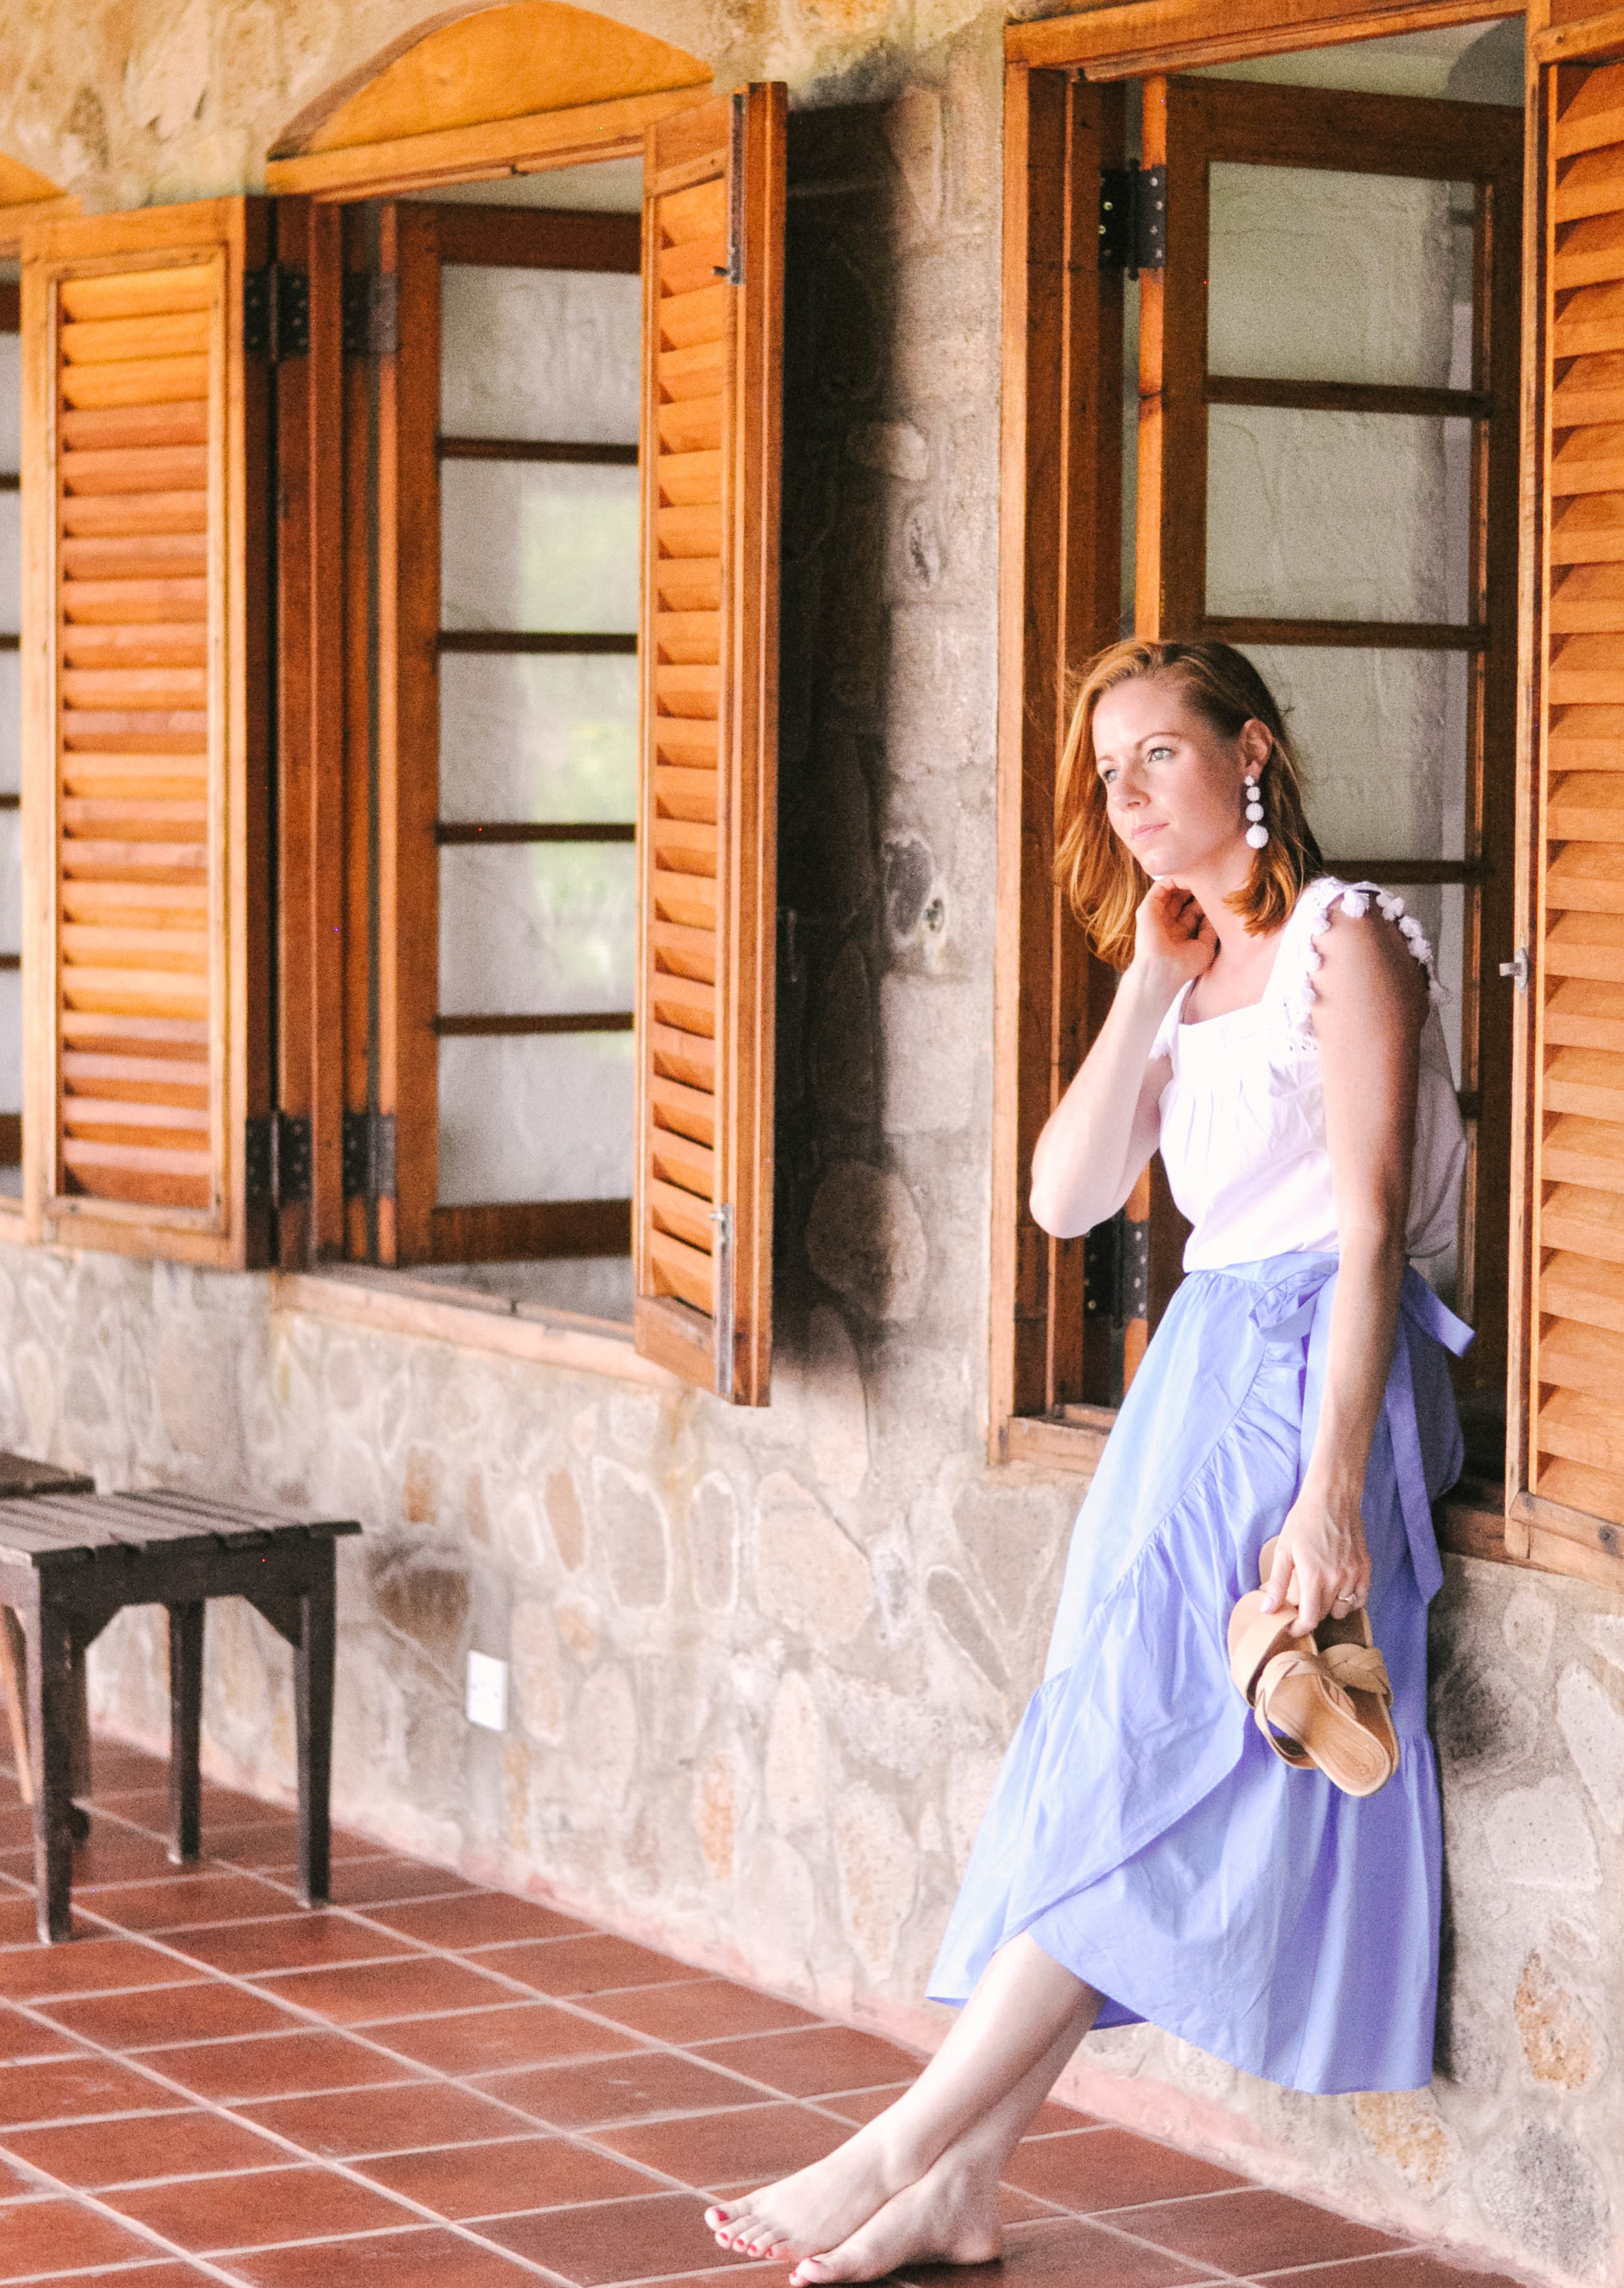 Woman posing against wooden shutters